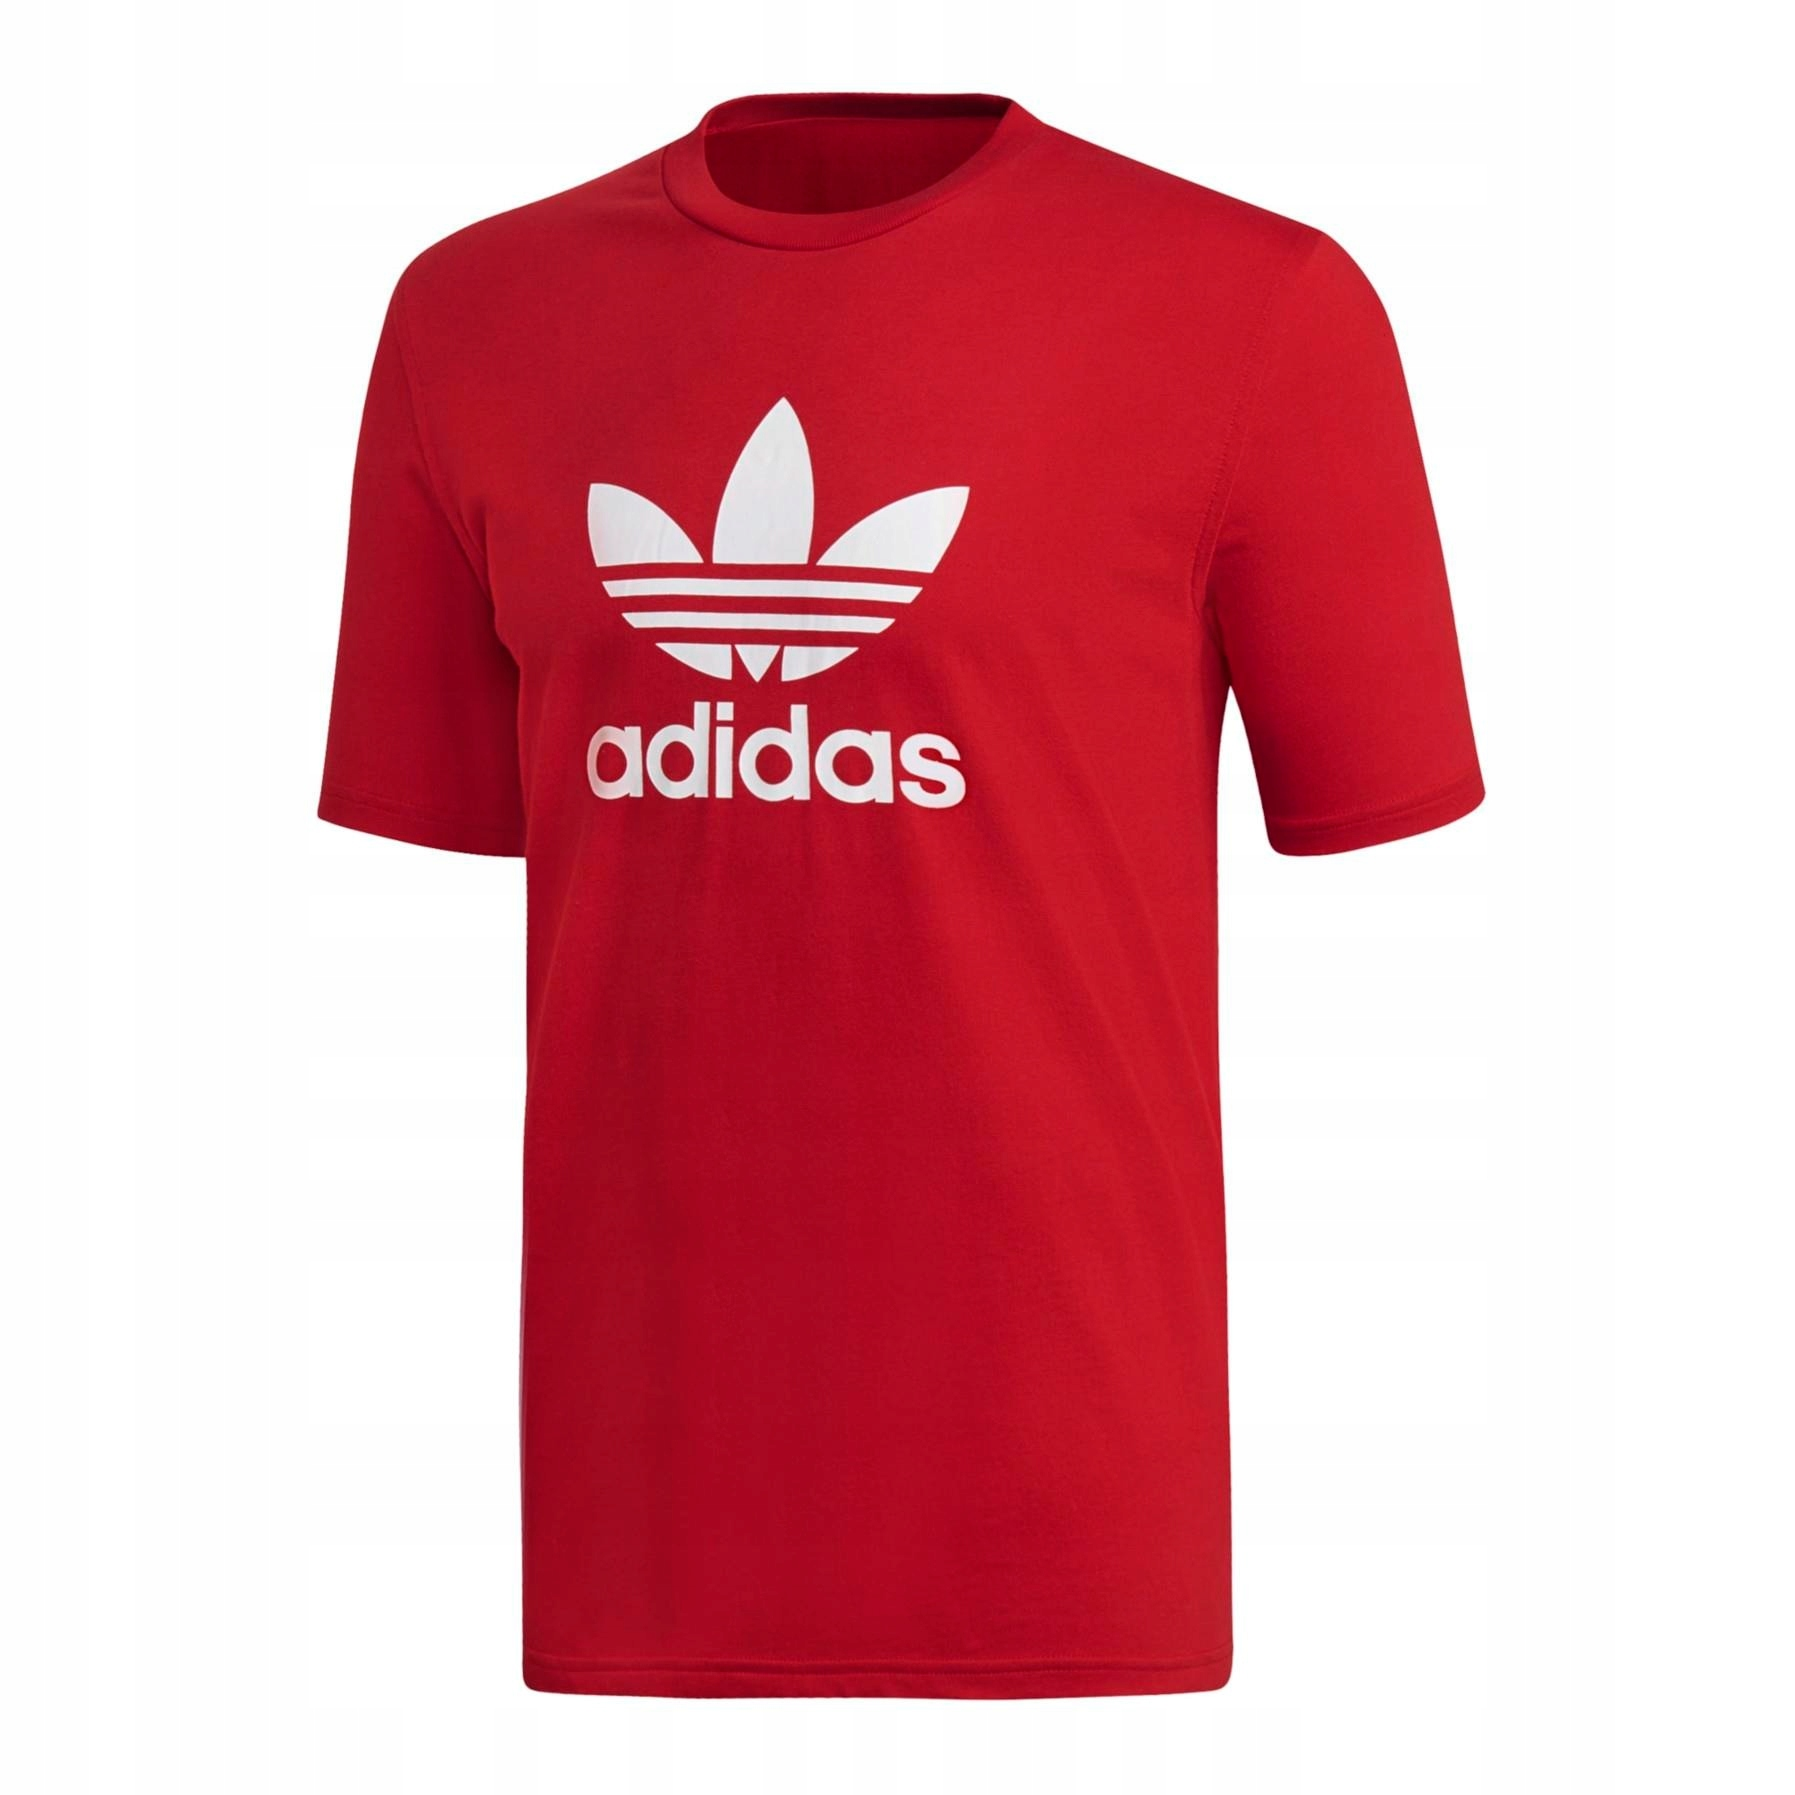 Koszulka adidas Trefoil DX3609 DX3609-a2 r M